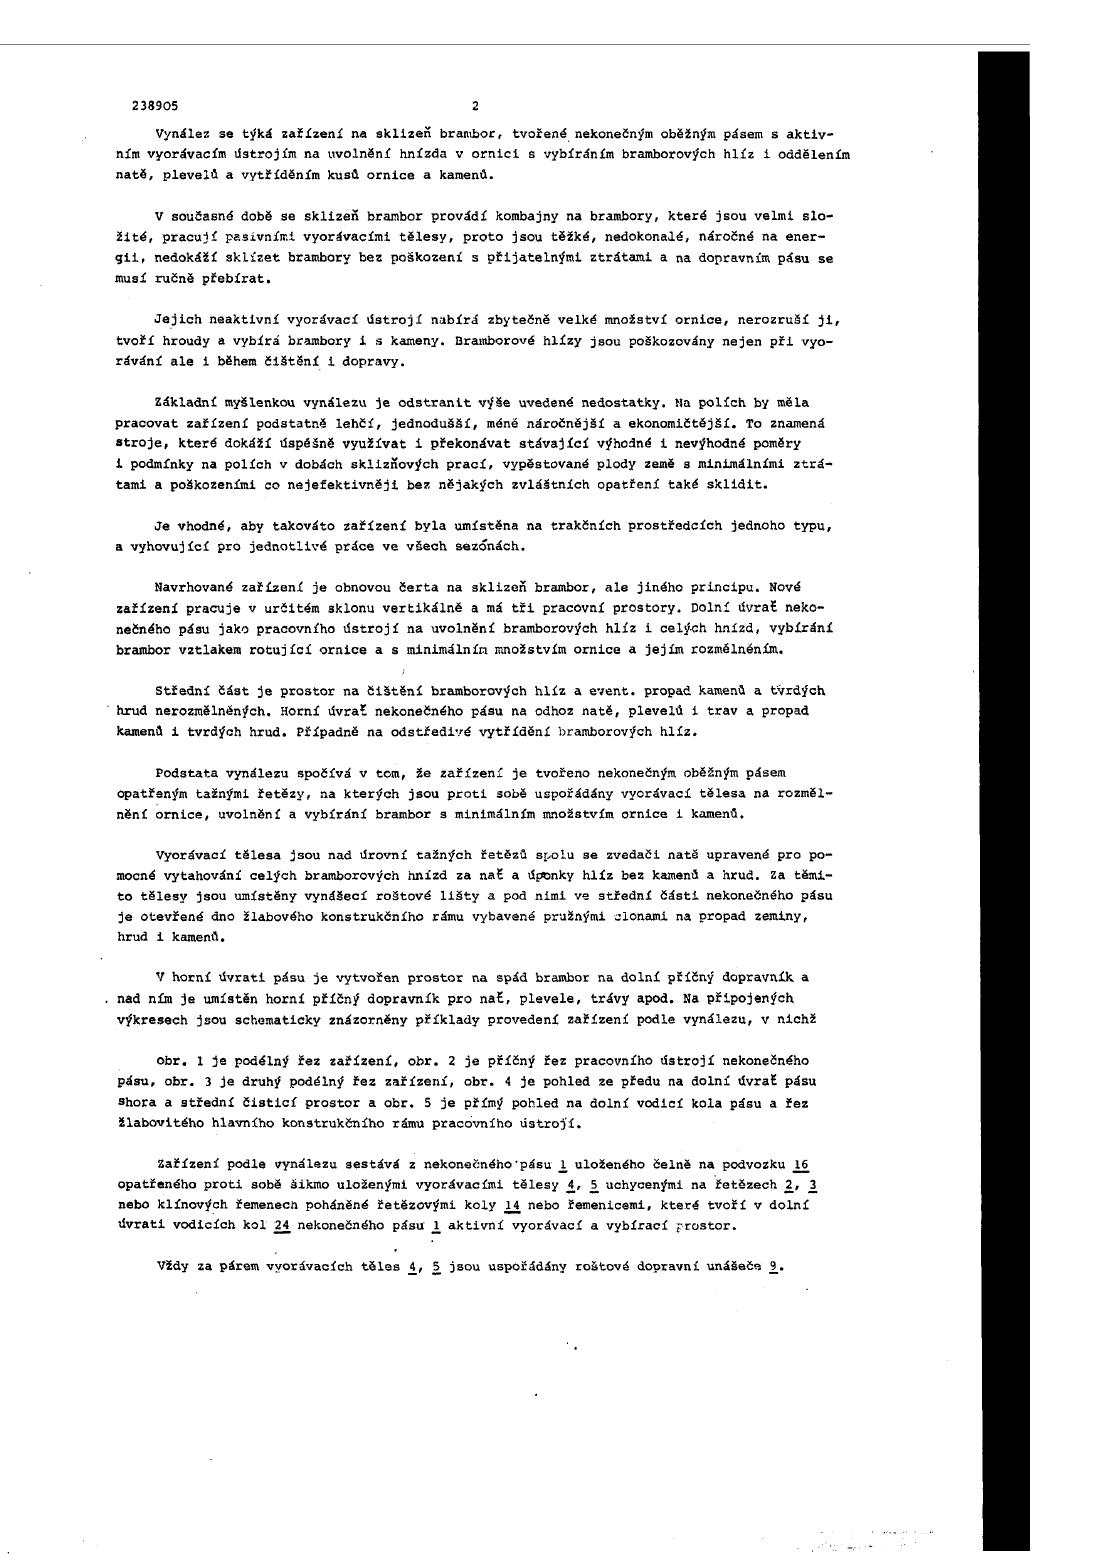 Zarizeni Na Sklizen Brambor 16 03 1987 238905 Databaza